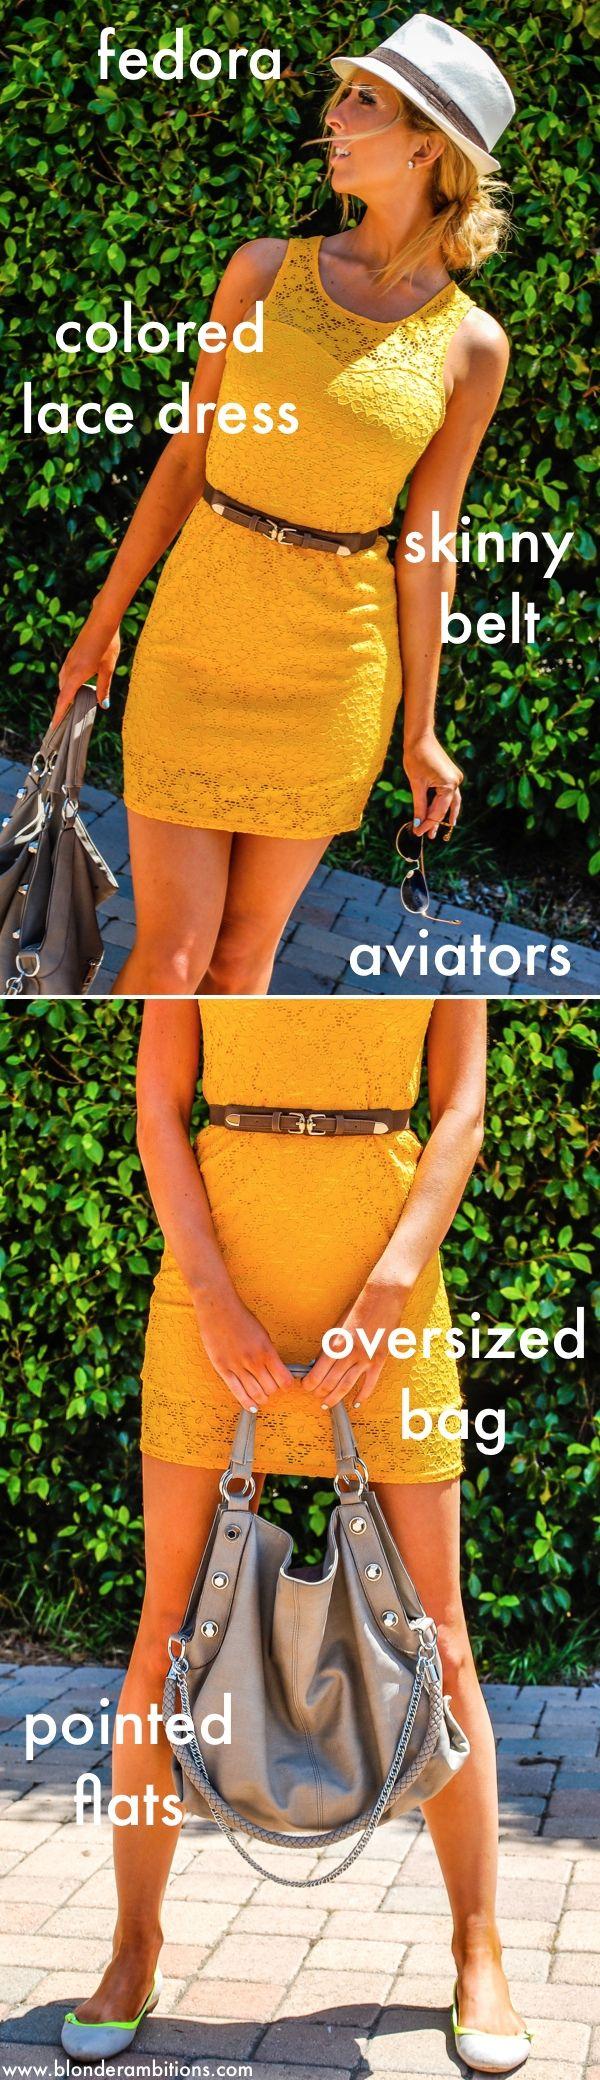 California Brunch. California Casual. California Girl. Fashion. Style. Lifestyle. Classic. #blonderambitions